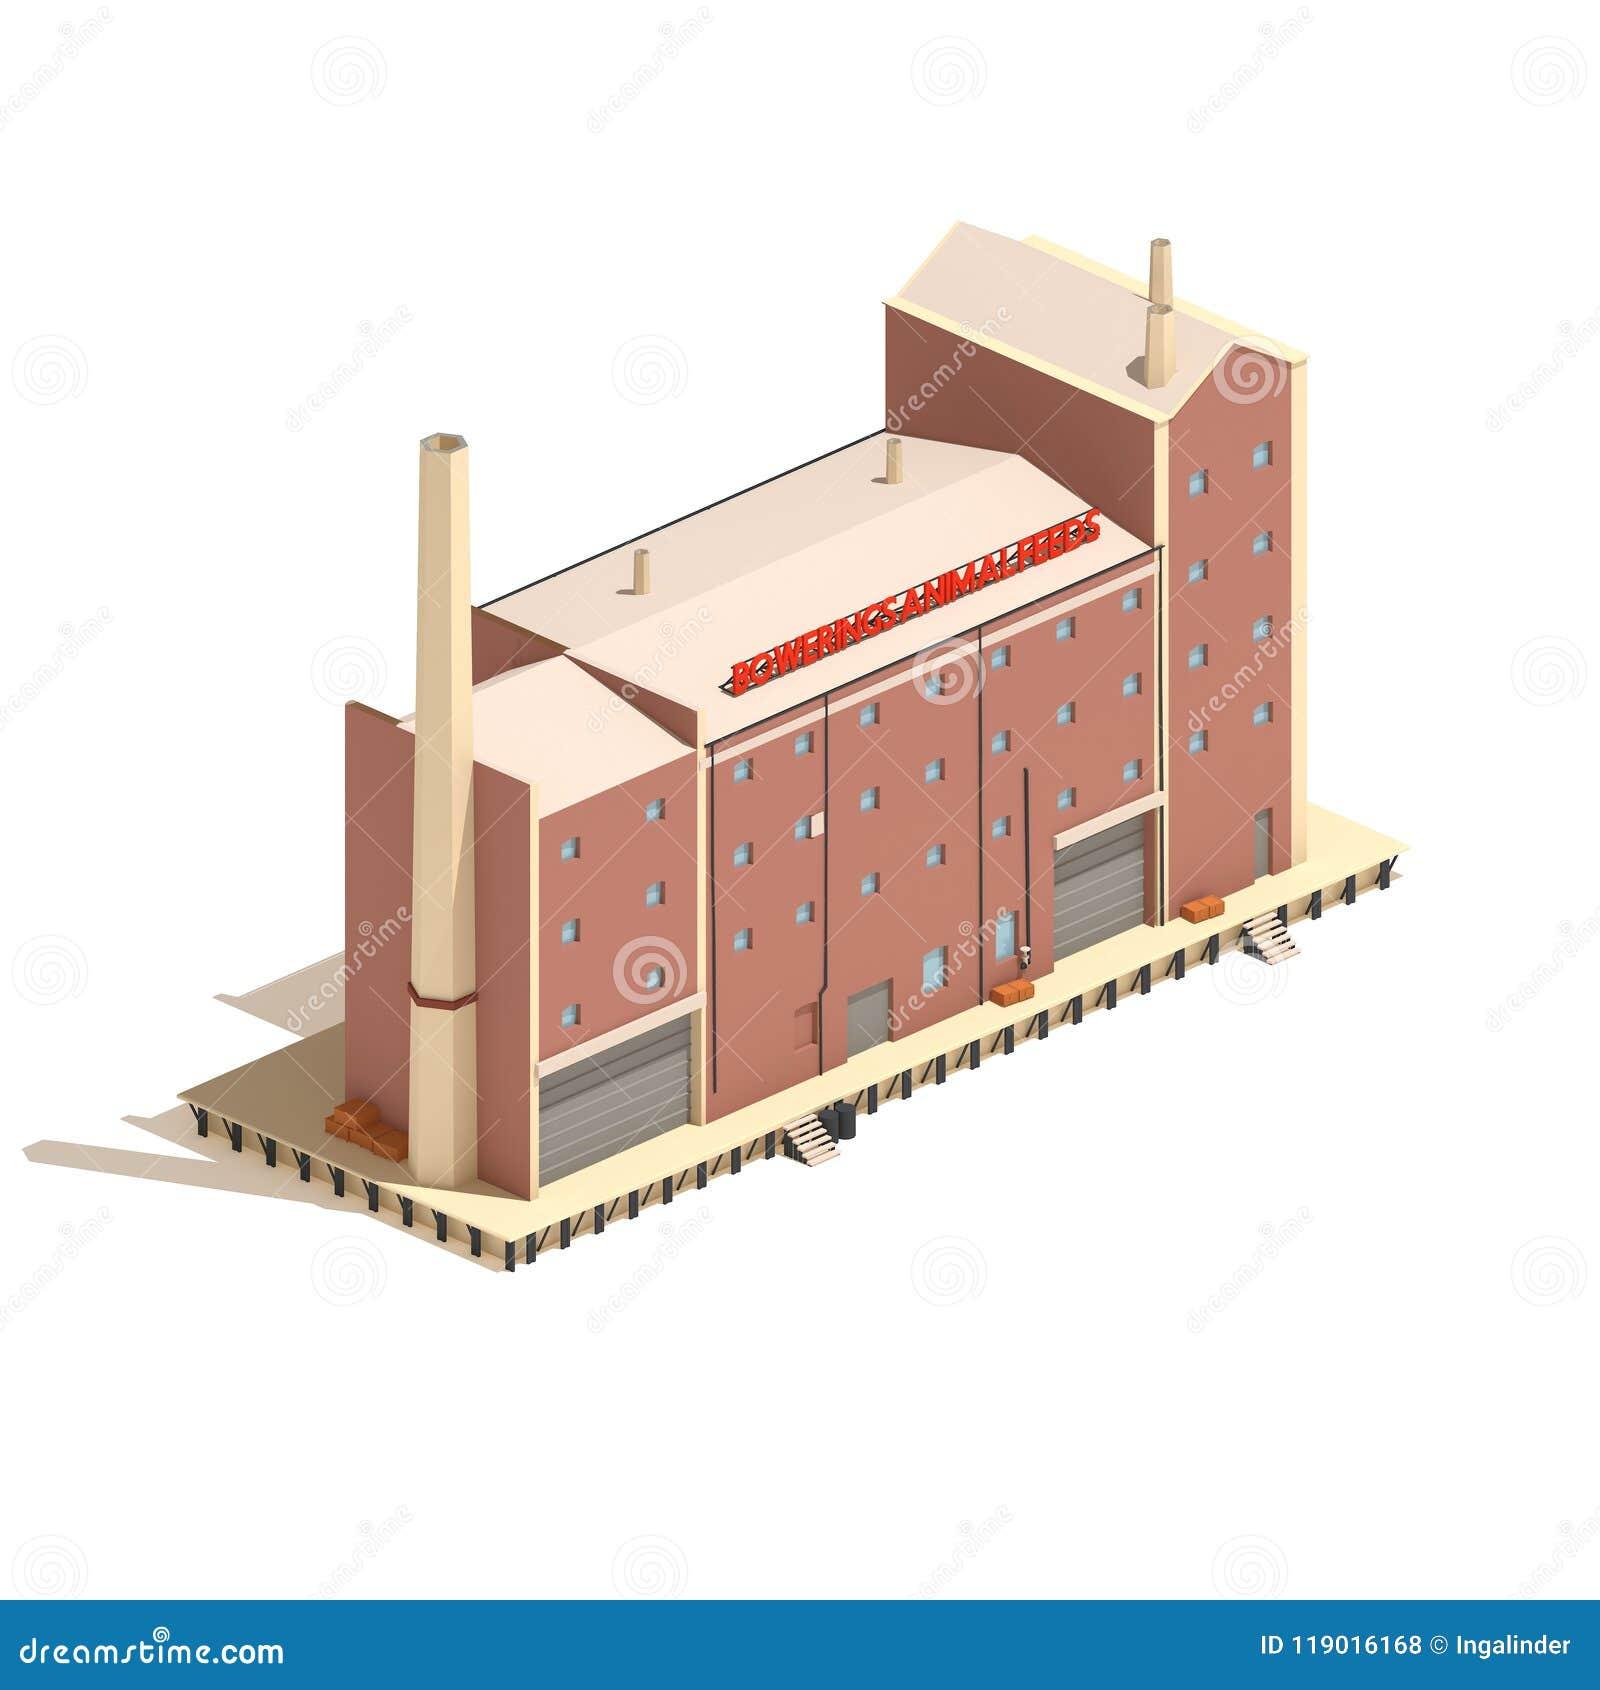 Flat 3d model isometric factory building illustration isolated on white background.